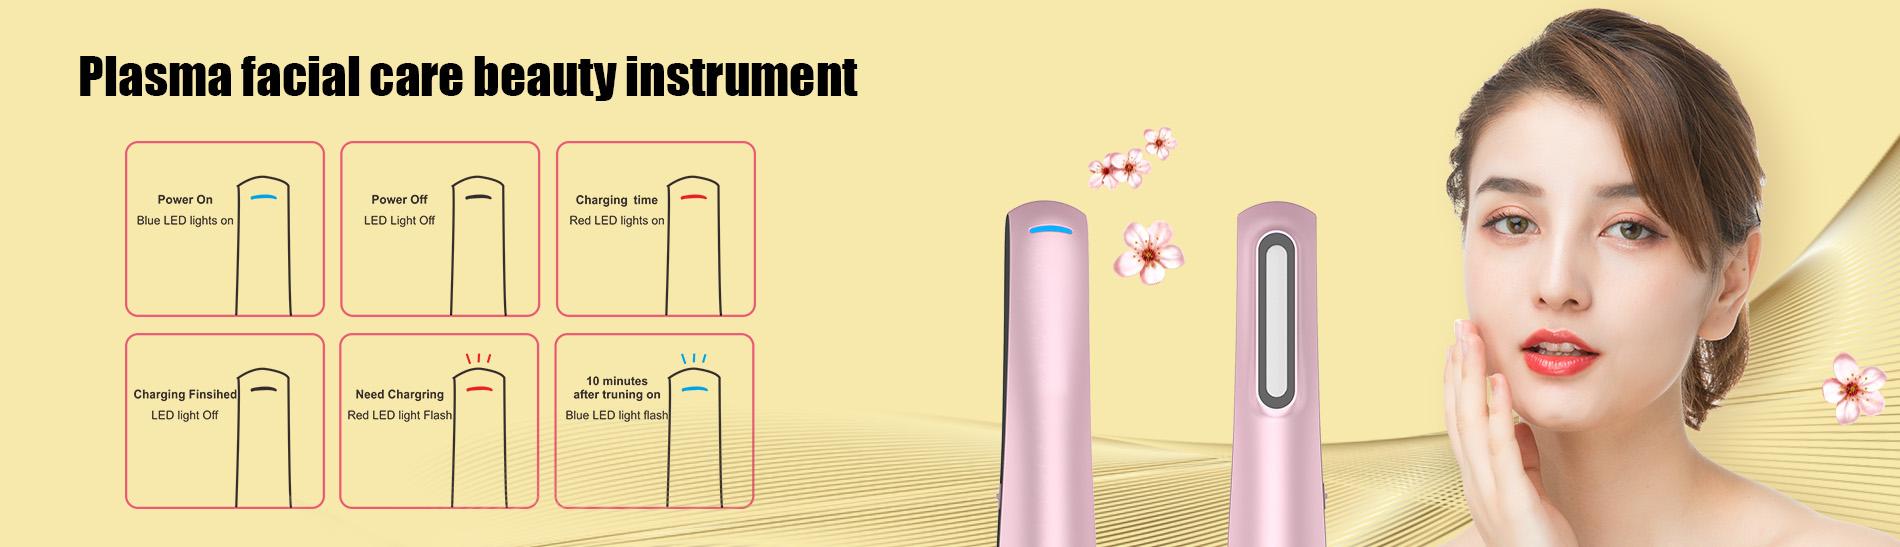 olansi beauty instrument manufacturer 3